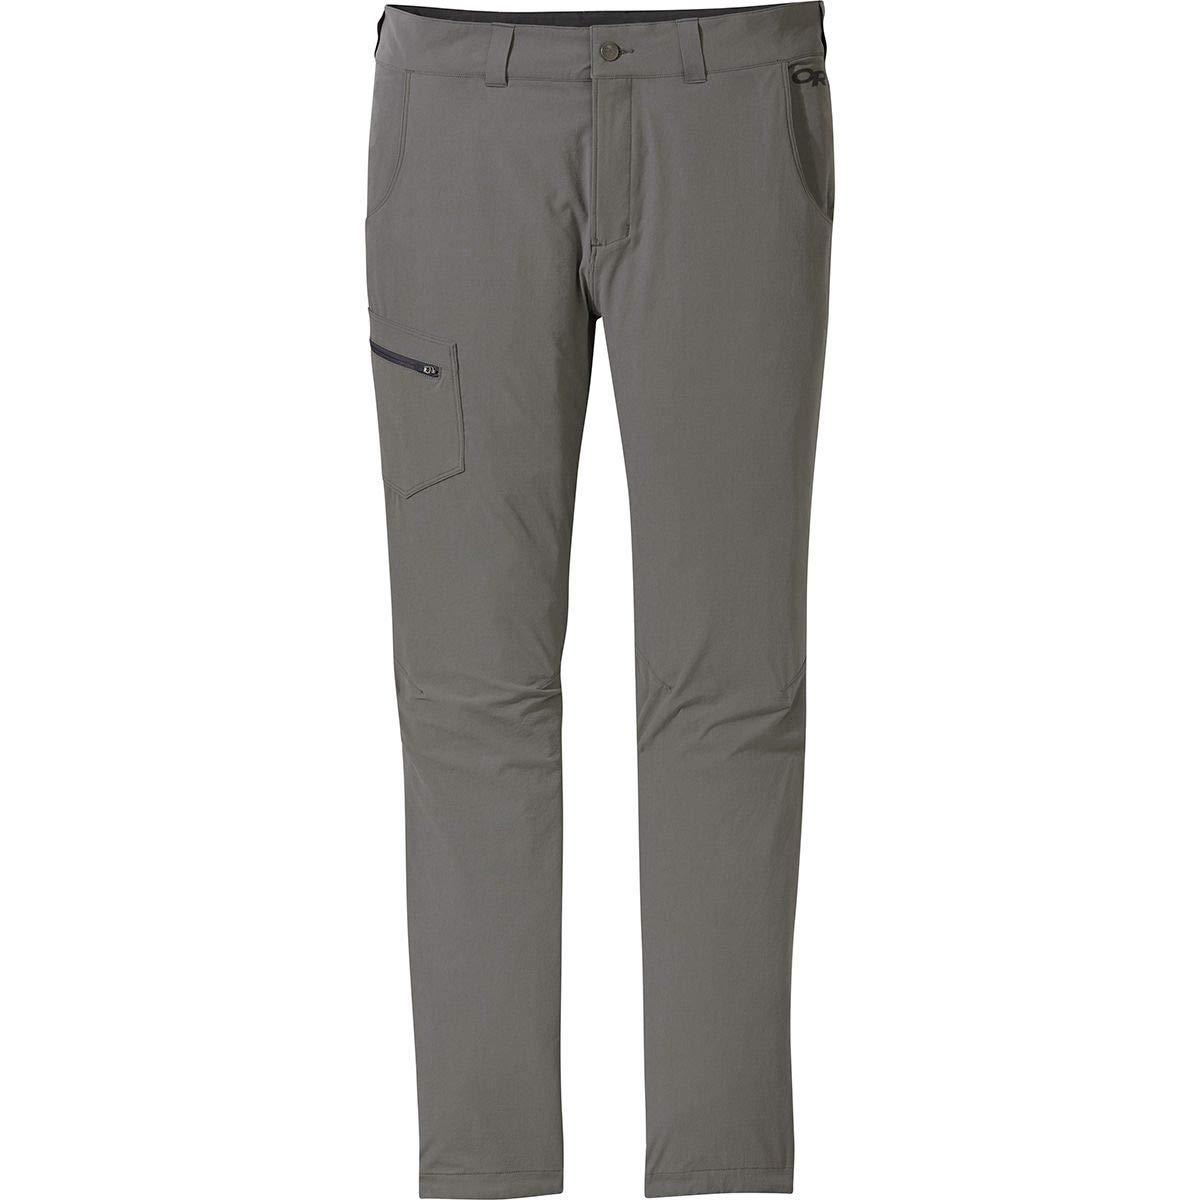 32 Outdoor Research Mens Ferrosi Pants